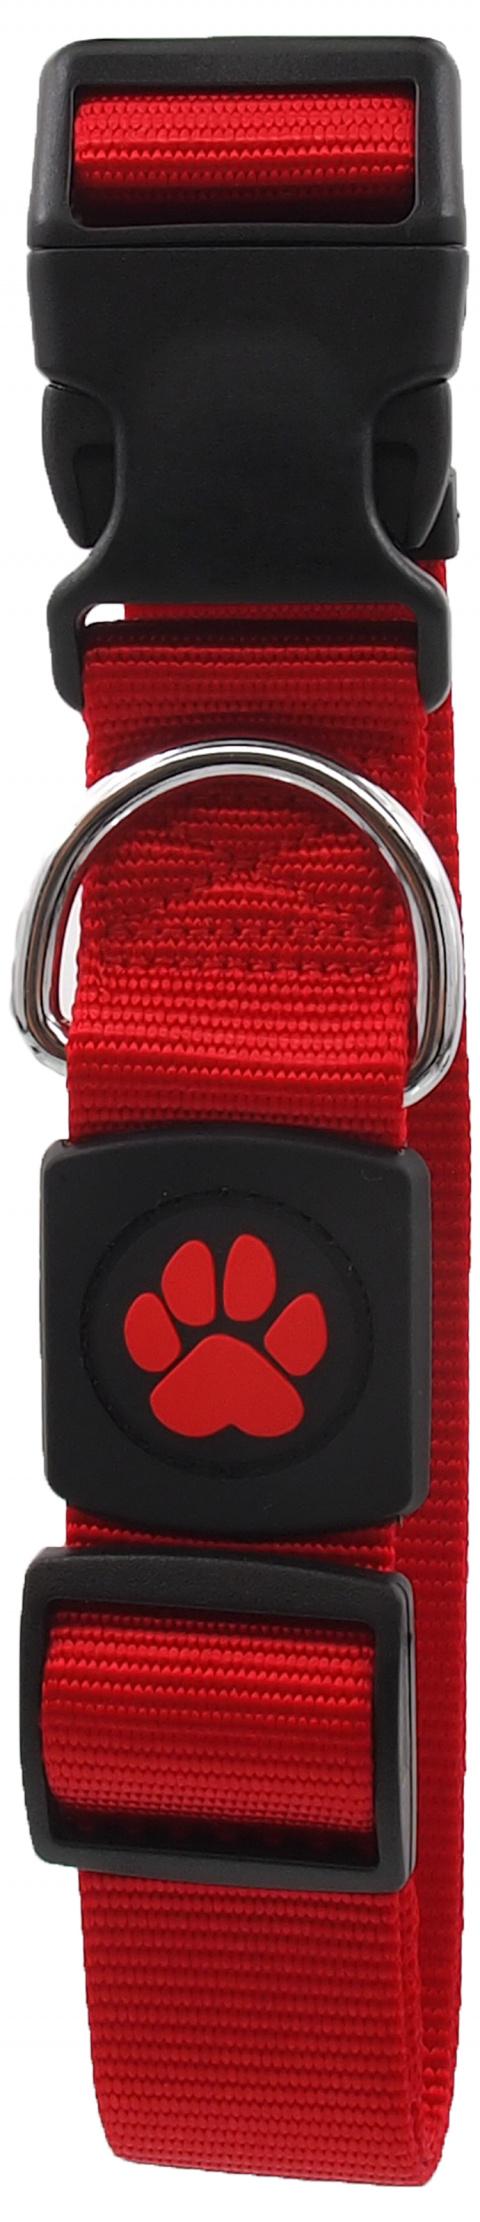 Obojek Active Dog Premium XL červený 3,8x51-78cm title=